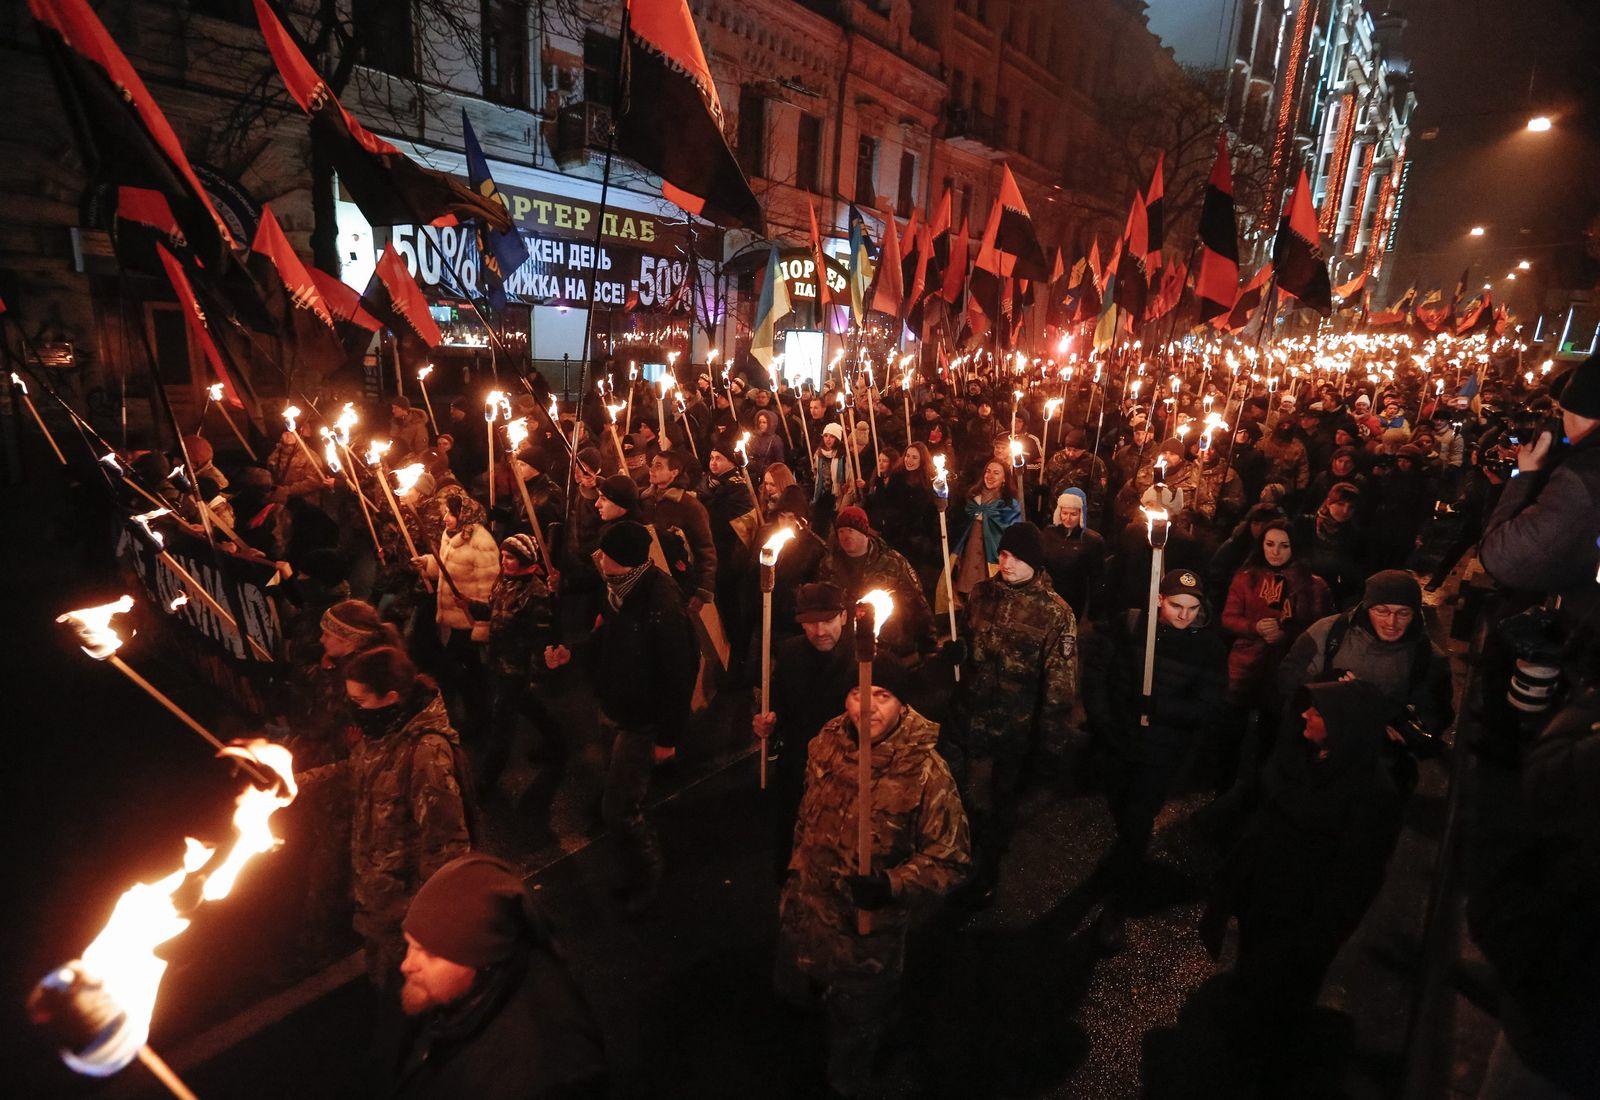 Ukrainians mark the 106th anniversary of Stepan Banderas birth